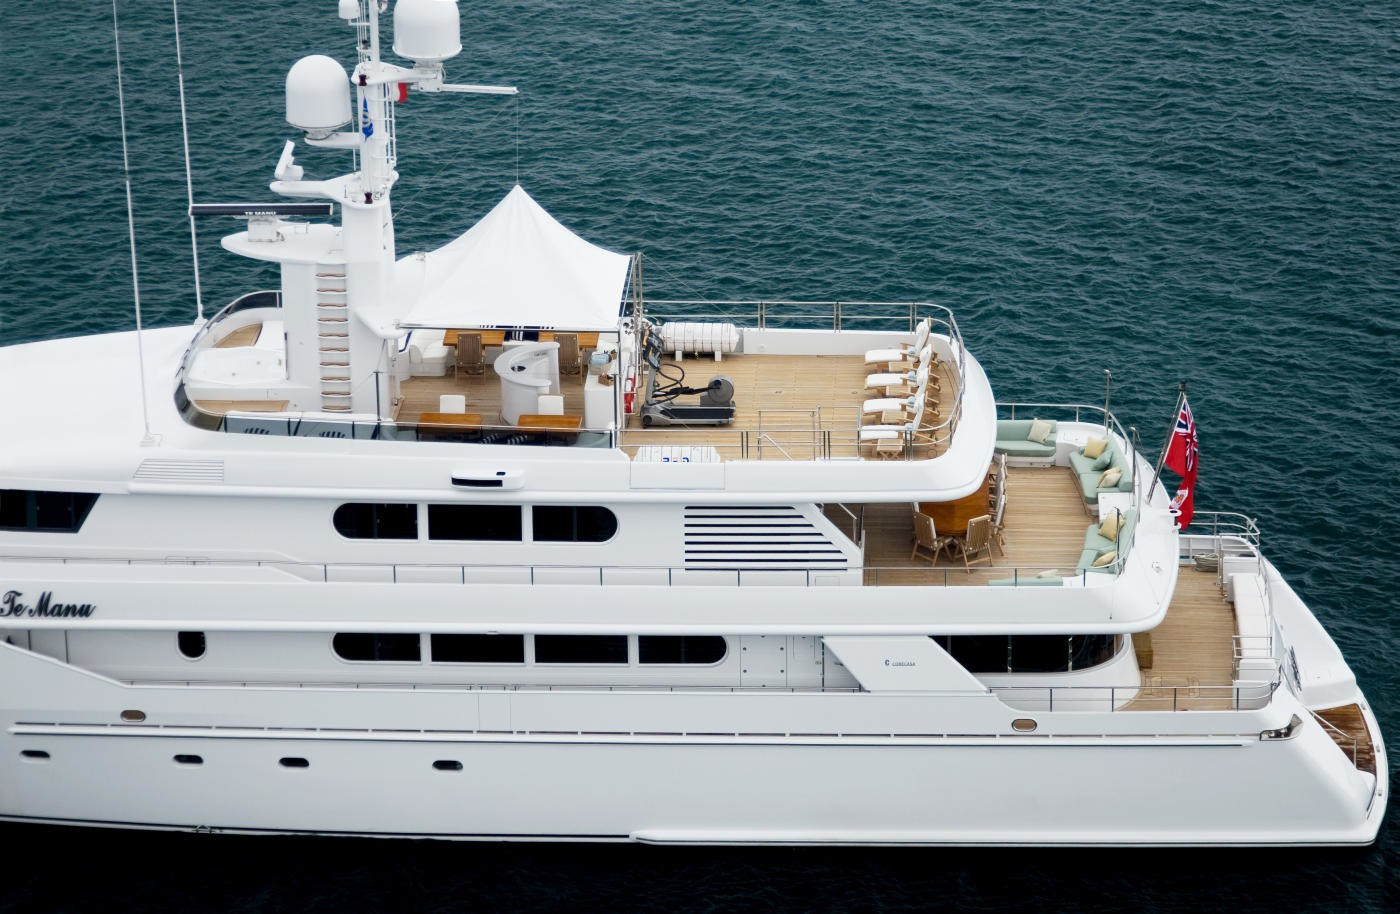 The 53m Yacht TE MANU